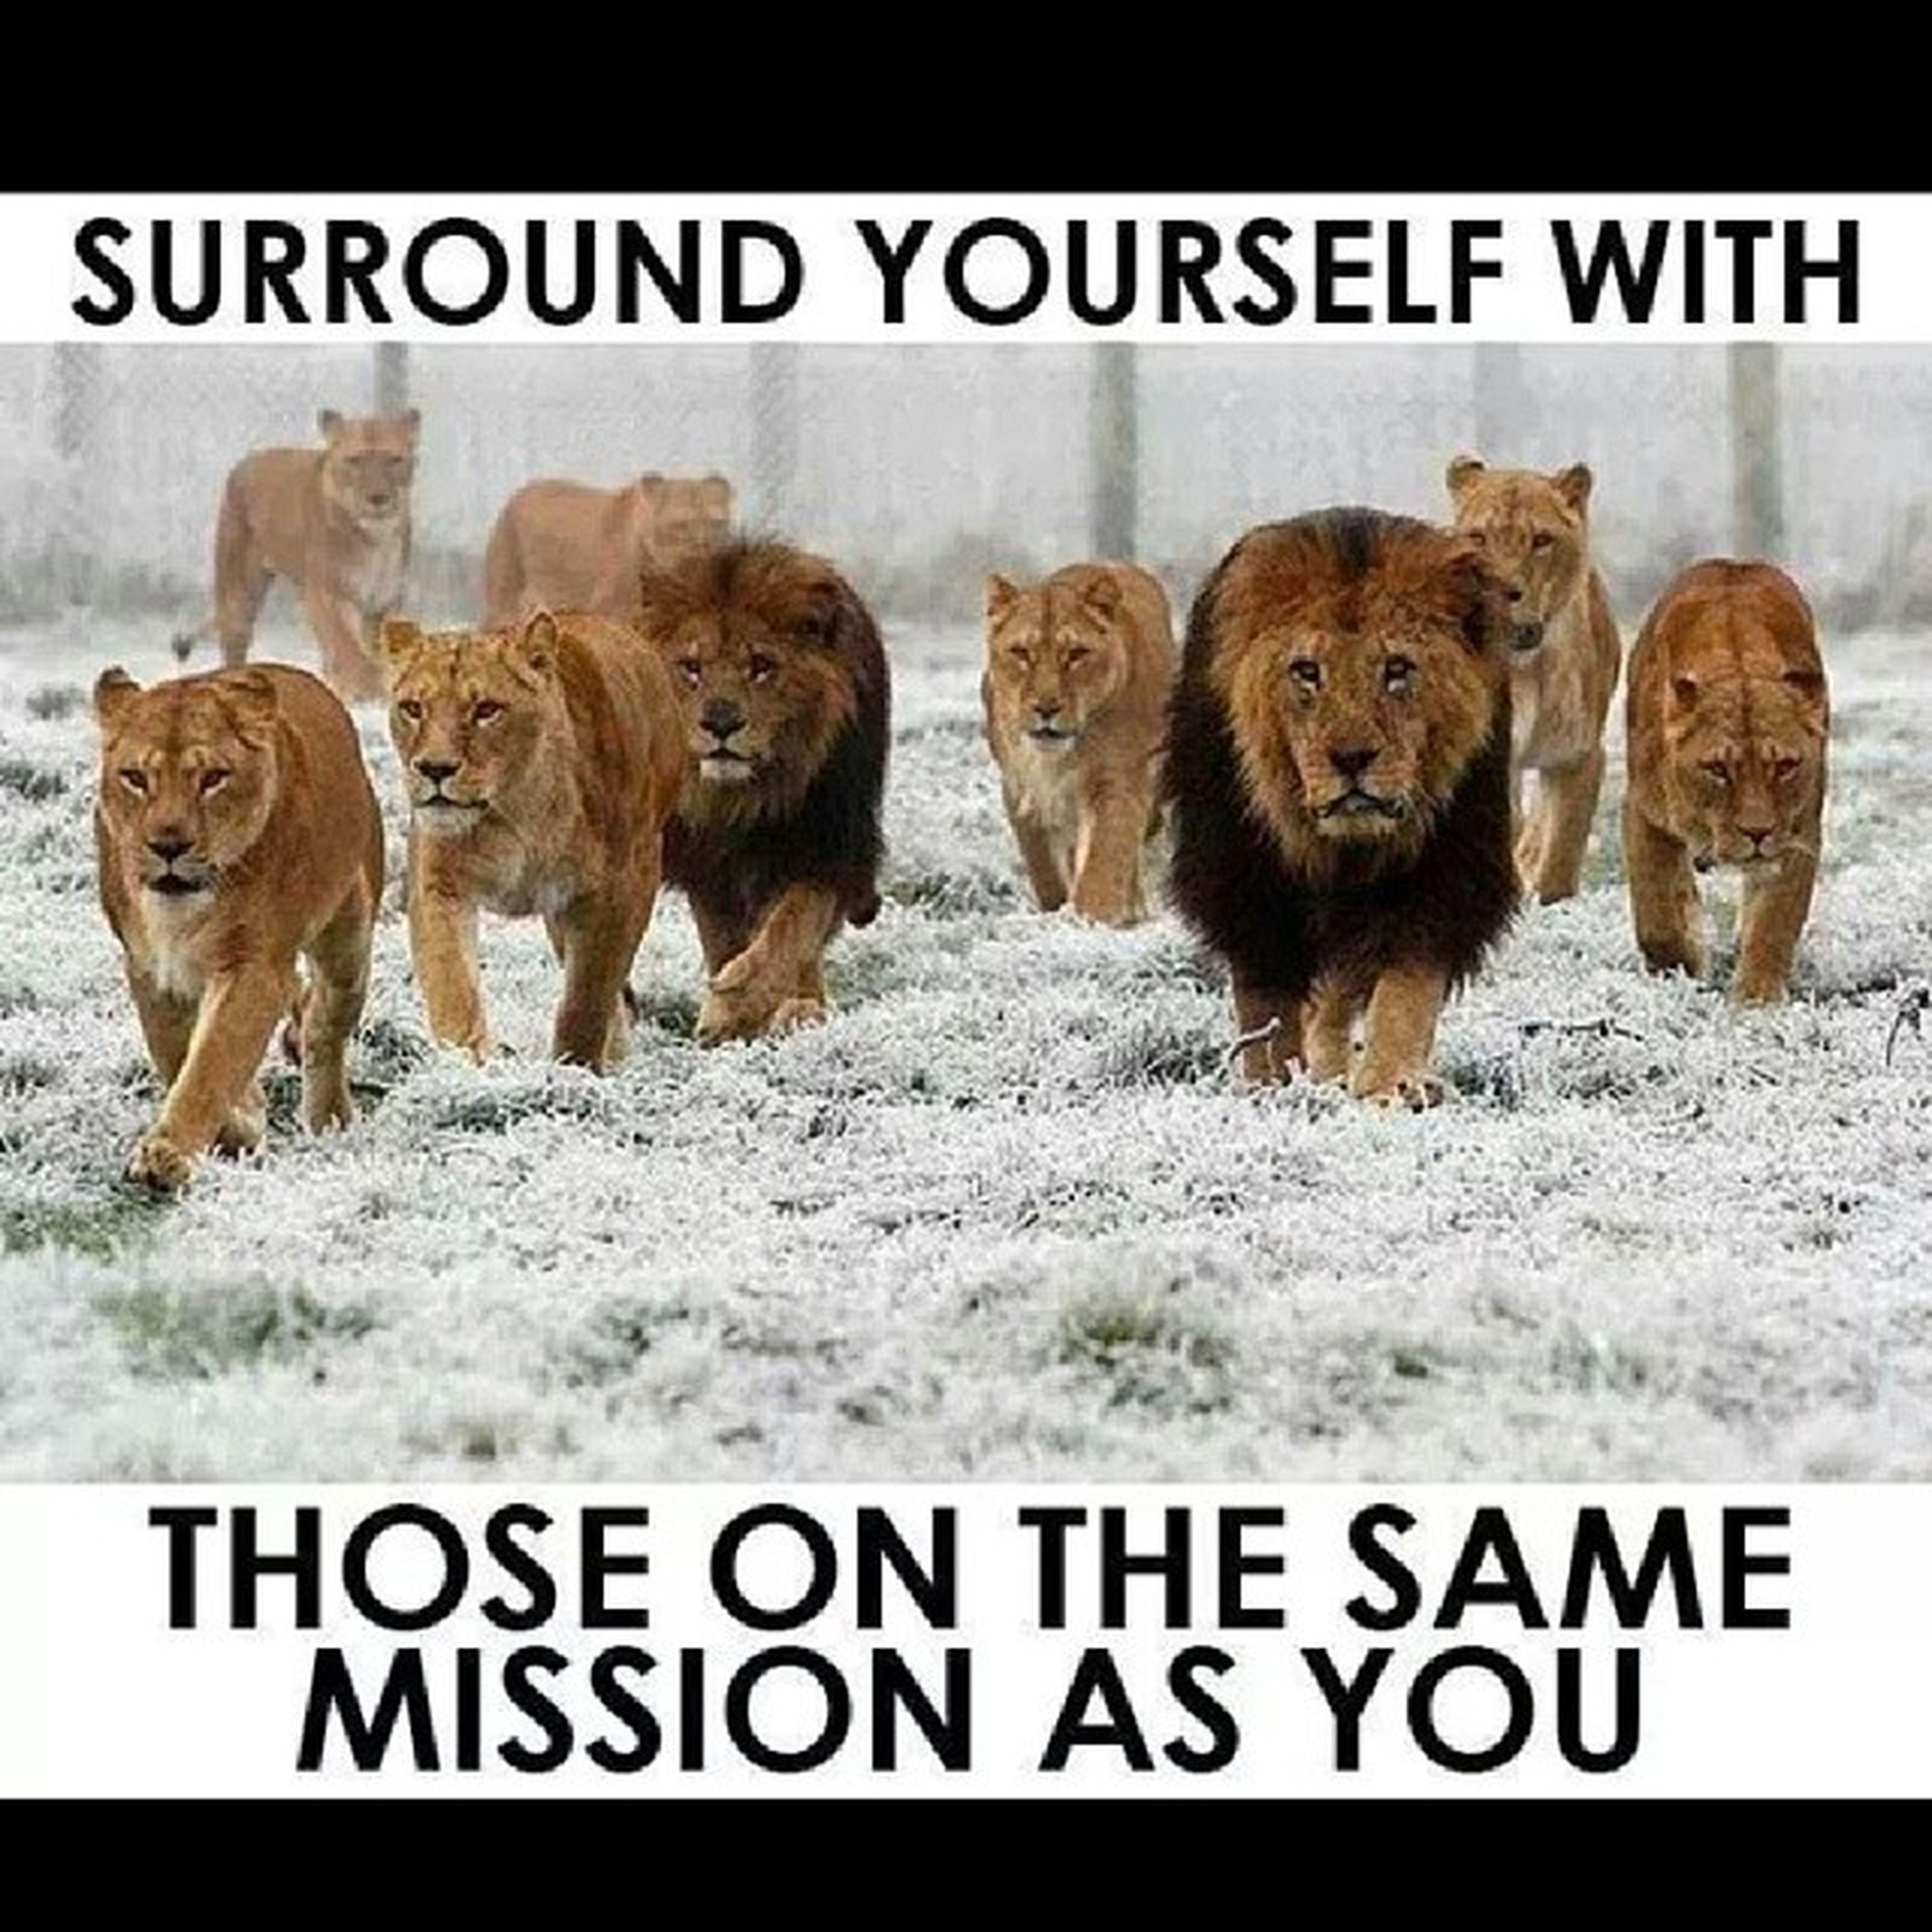 ShitThatIsAMust LionsTigersAndBears R Always Welcomed... SquadUp  InstaQuotes